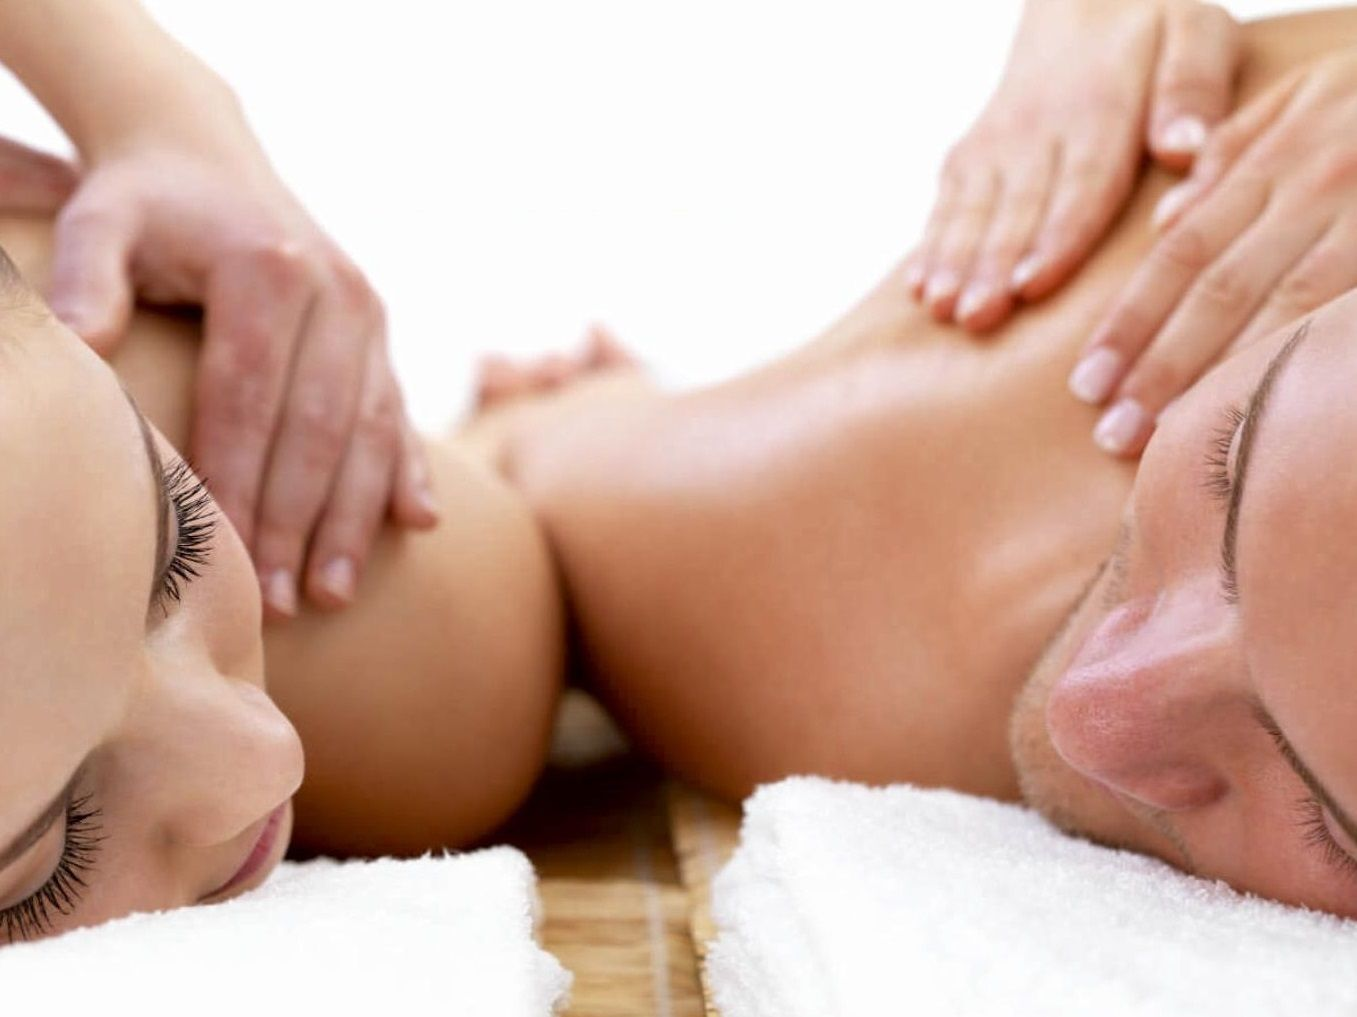 Couple massage: Servicios de Masajes Manhattan